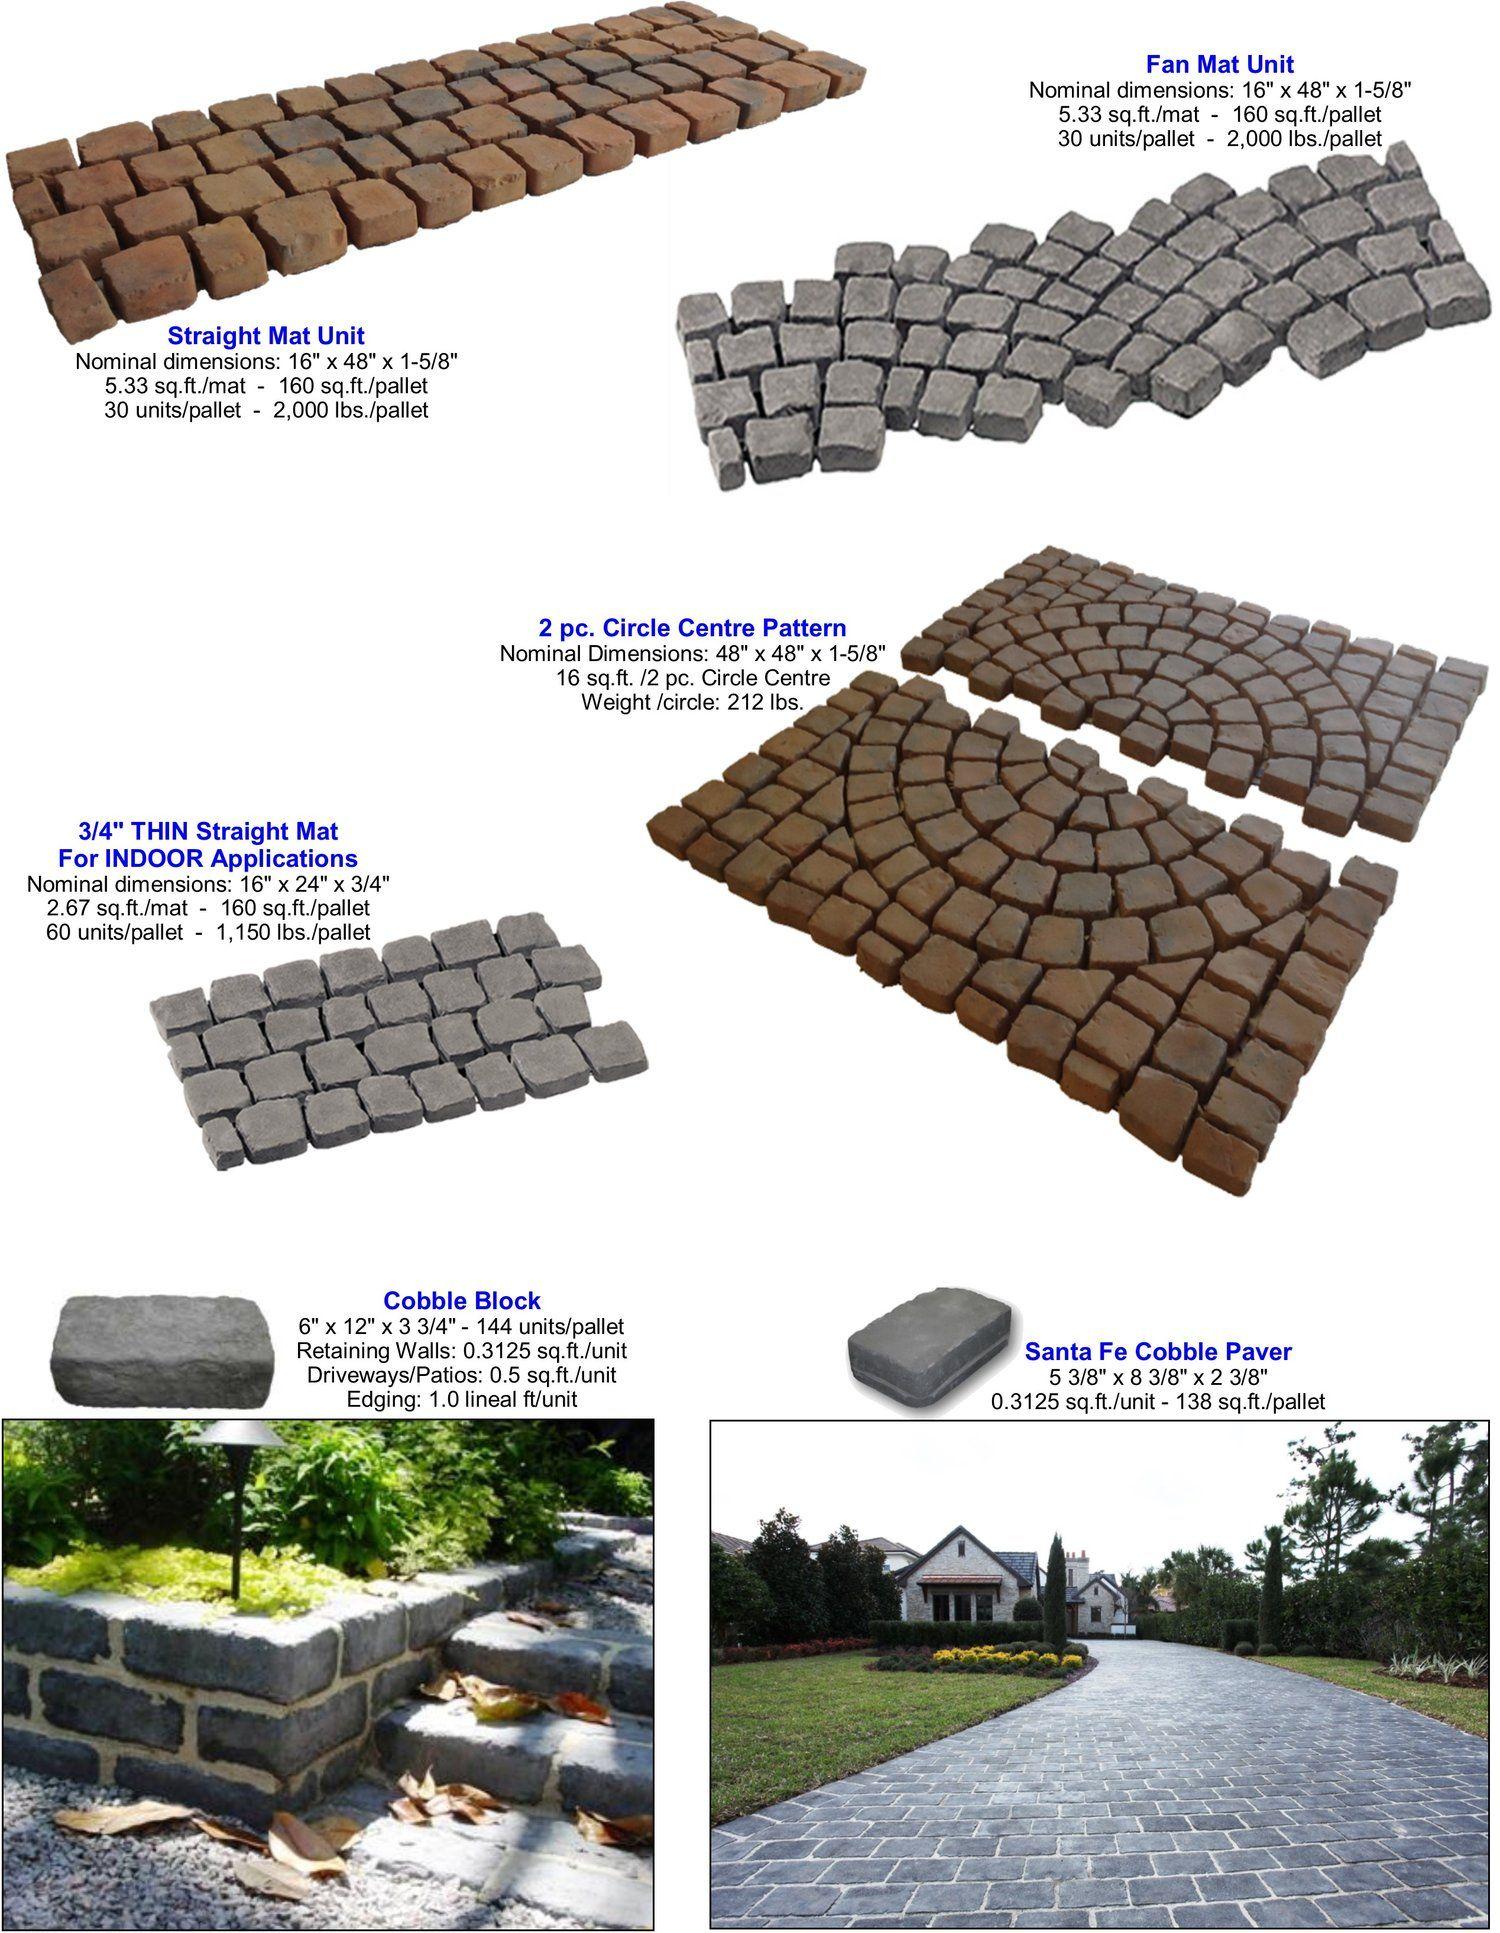 Cobblesystems Riccobene Concrete Masonry Design Cobblestone Pavers Deck Designs Backyard Garden Landscape Design